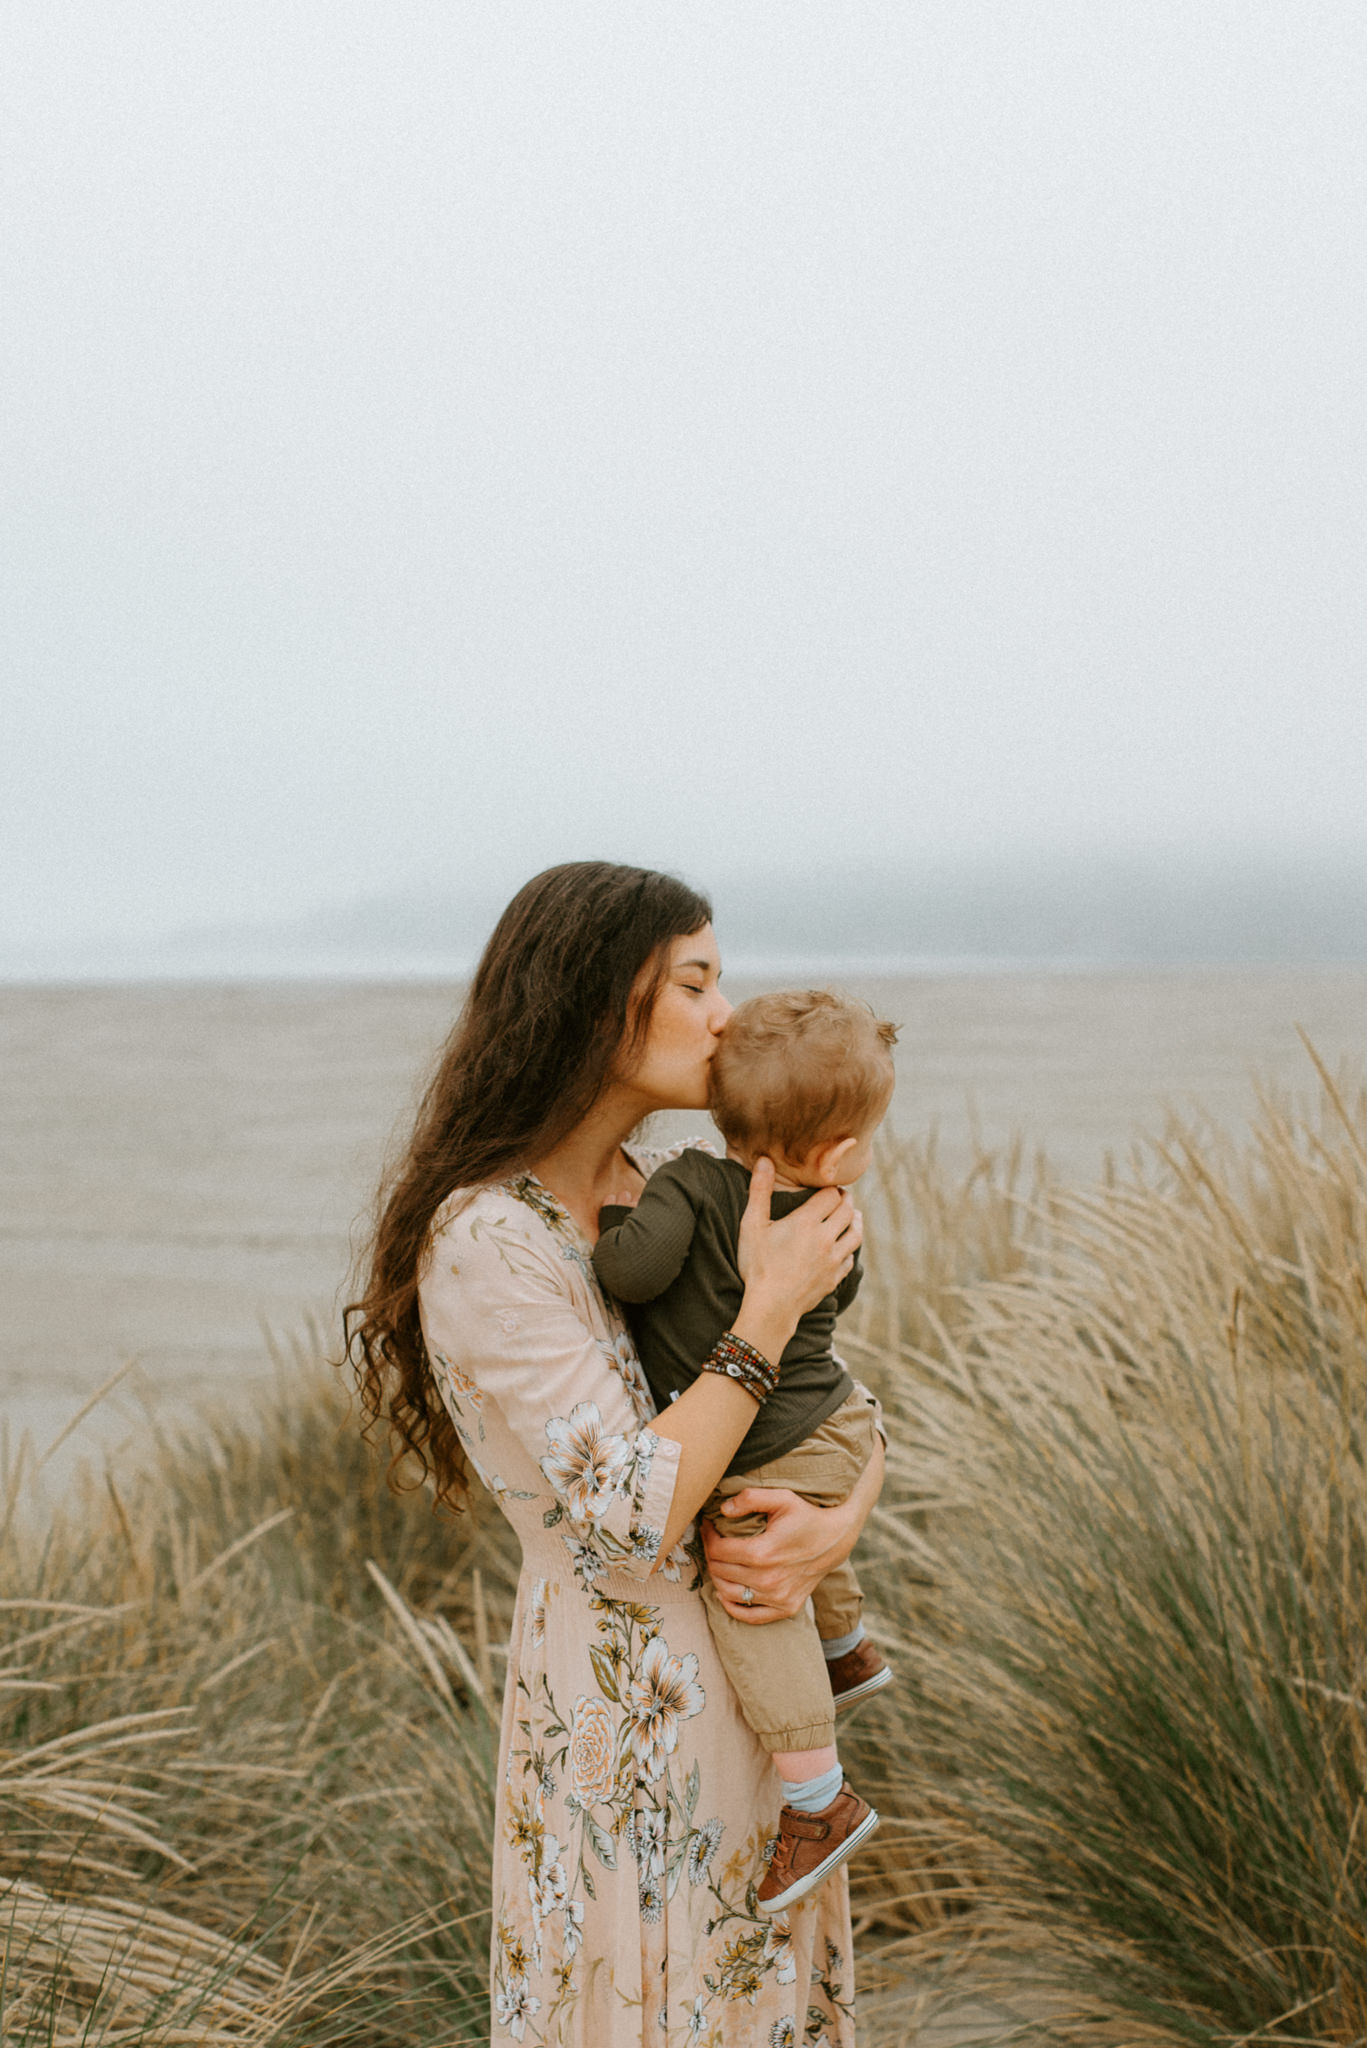 Corpus-Christi-Family-Photographer-Kerlyn-Van-Gelder-Photography39.jpg